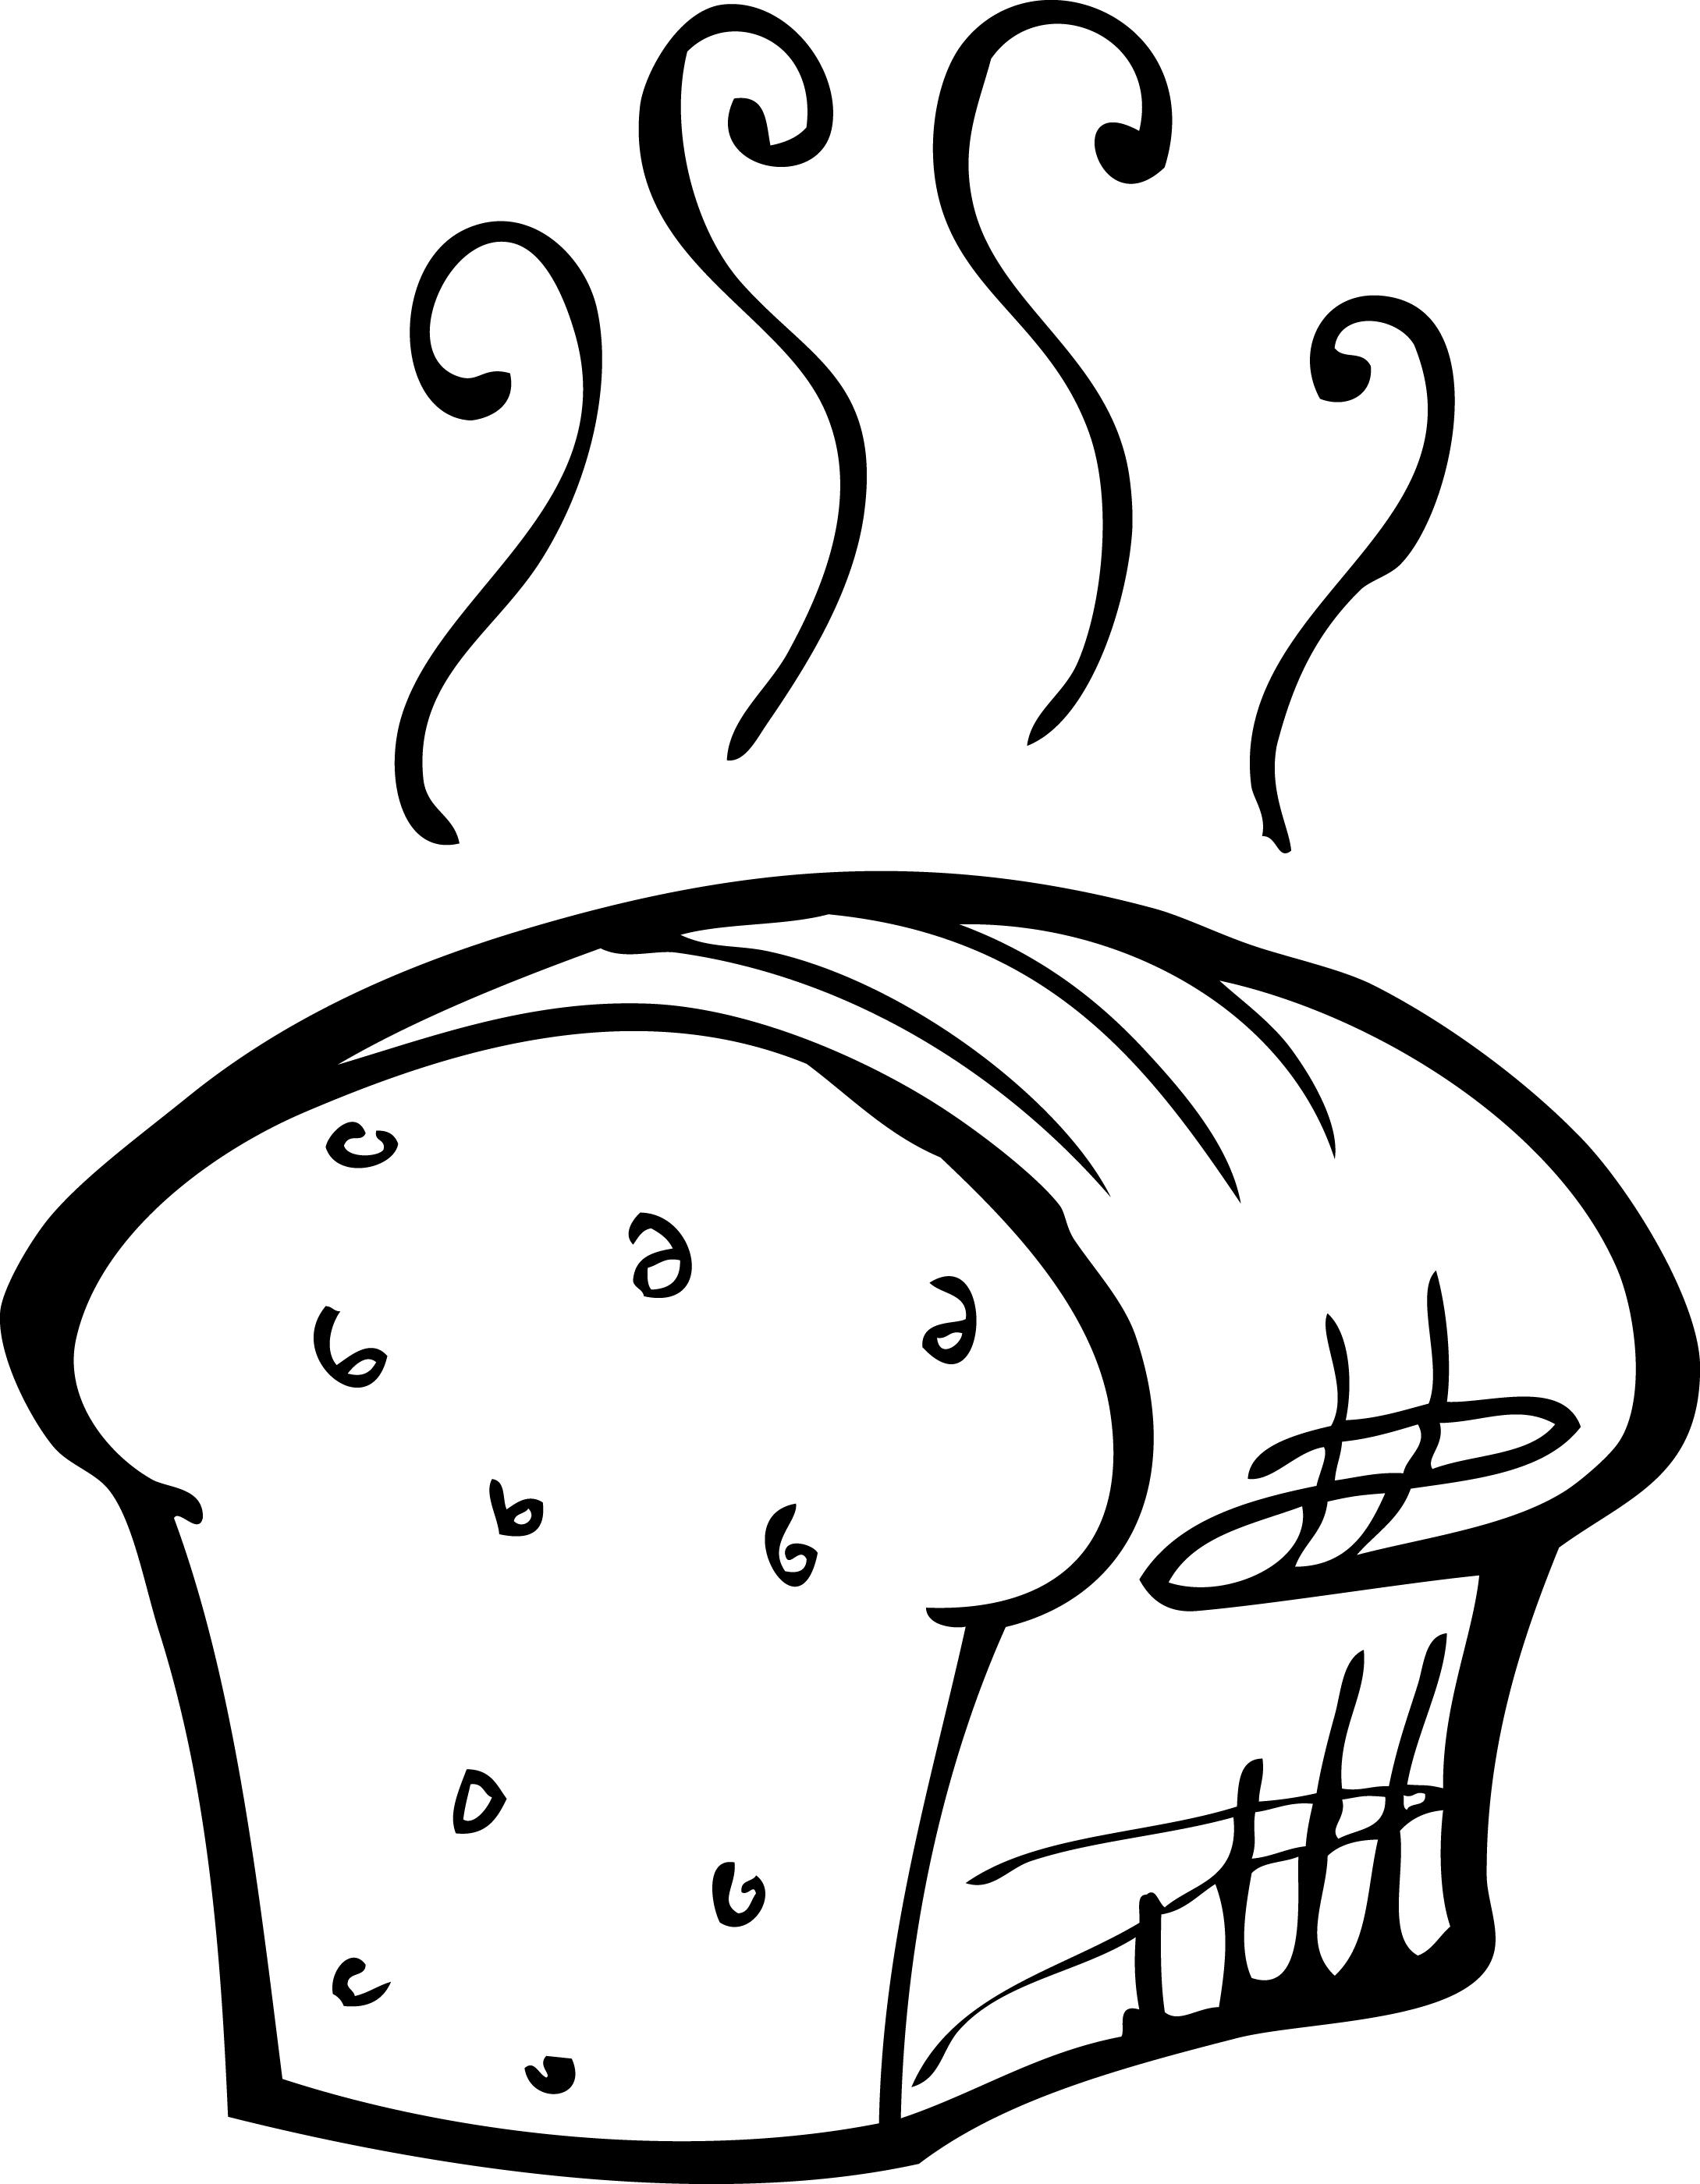 Egg . Bread clipart yeast bread